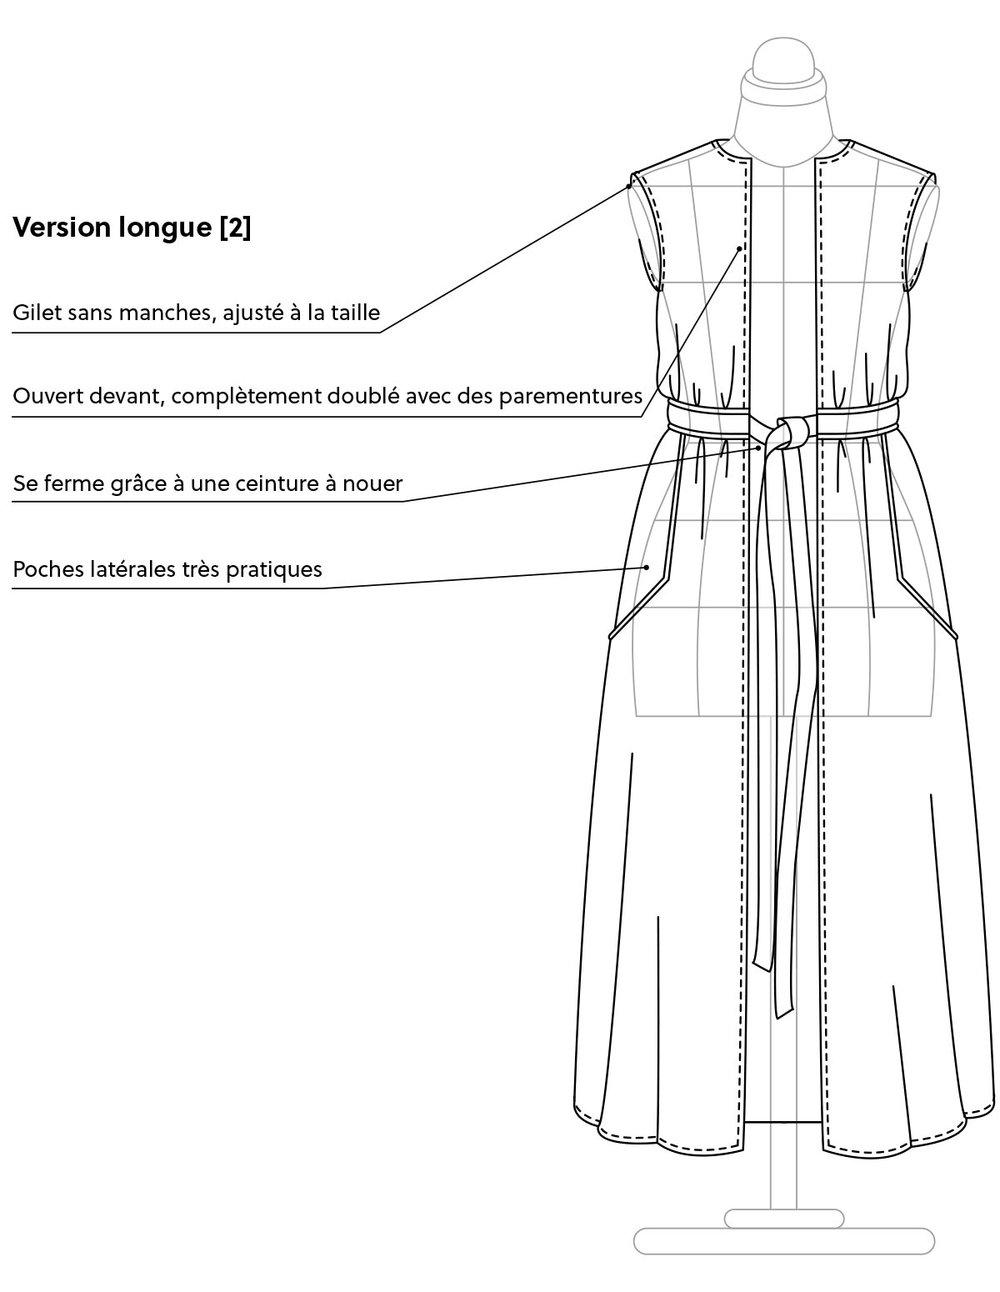 aestiva-features-long-fr.jpg